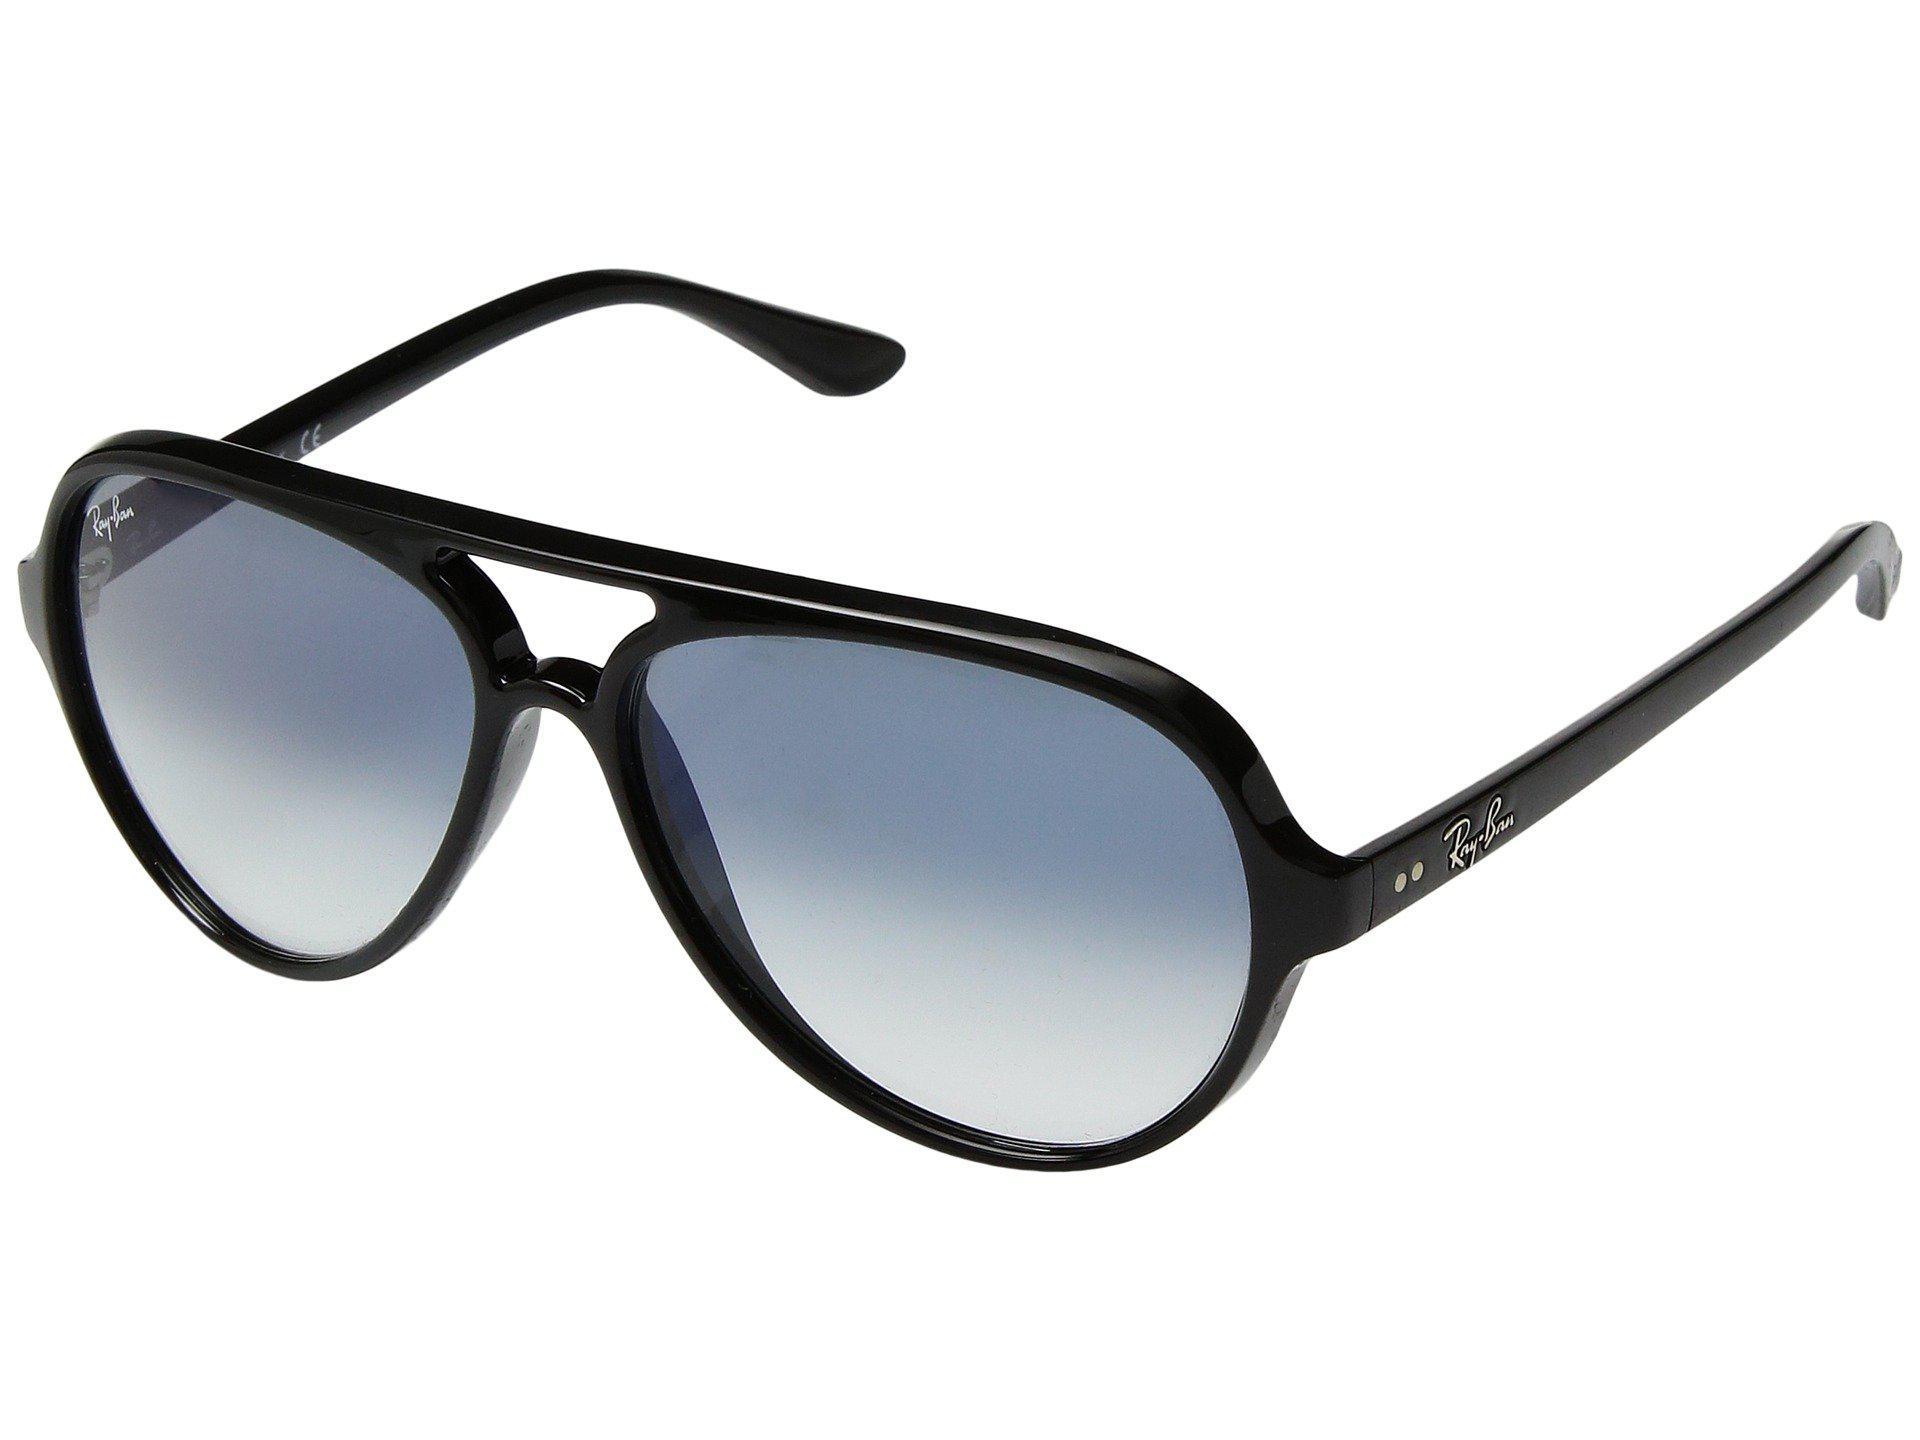 440d4b4705 Ray-Ban. Women s Cats 5000 Rb4125 59mm (black light Blue Gradient) Fashion  Sunglasses